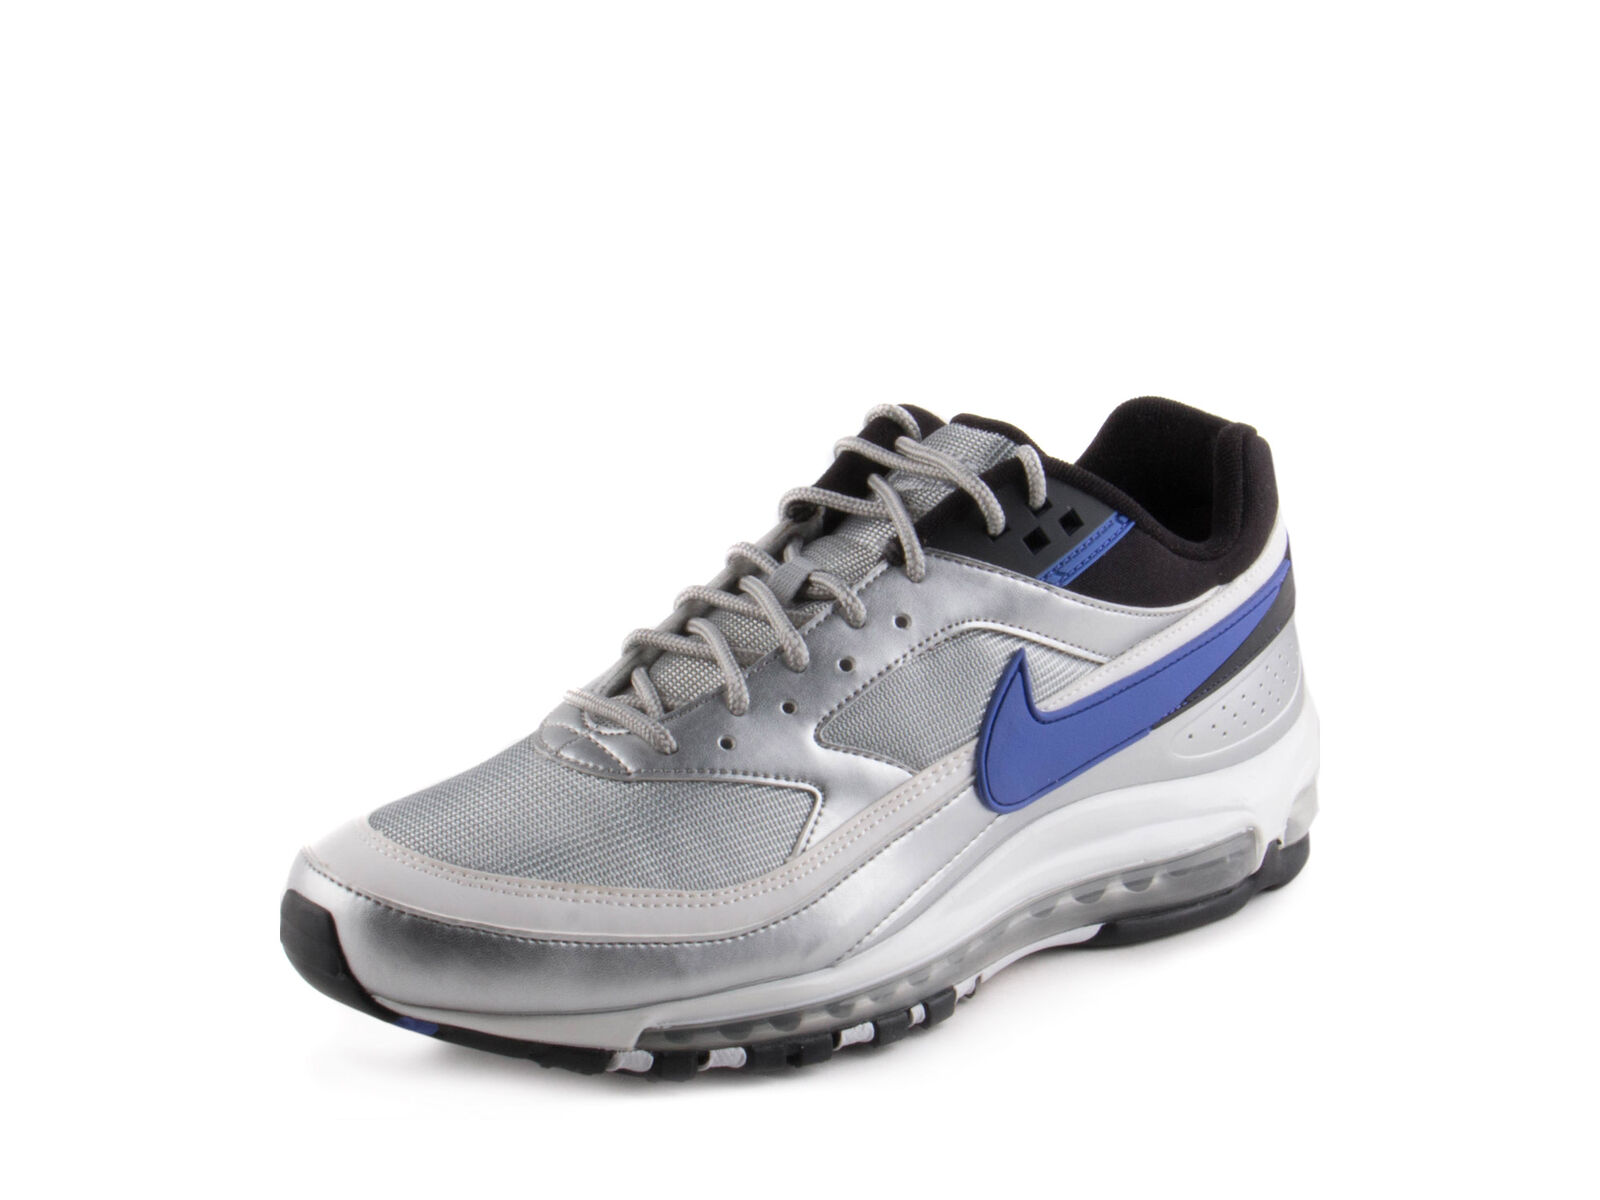 new styles 97ac8 25589 Nike Mens Air Max 97 BW Mtlc Silver-Persian purple purple purple AO2406-002